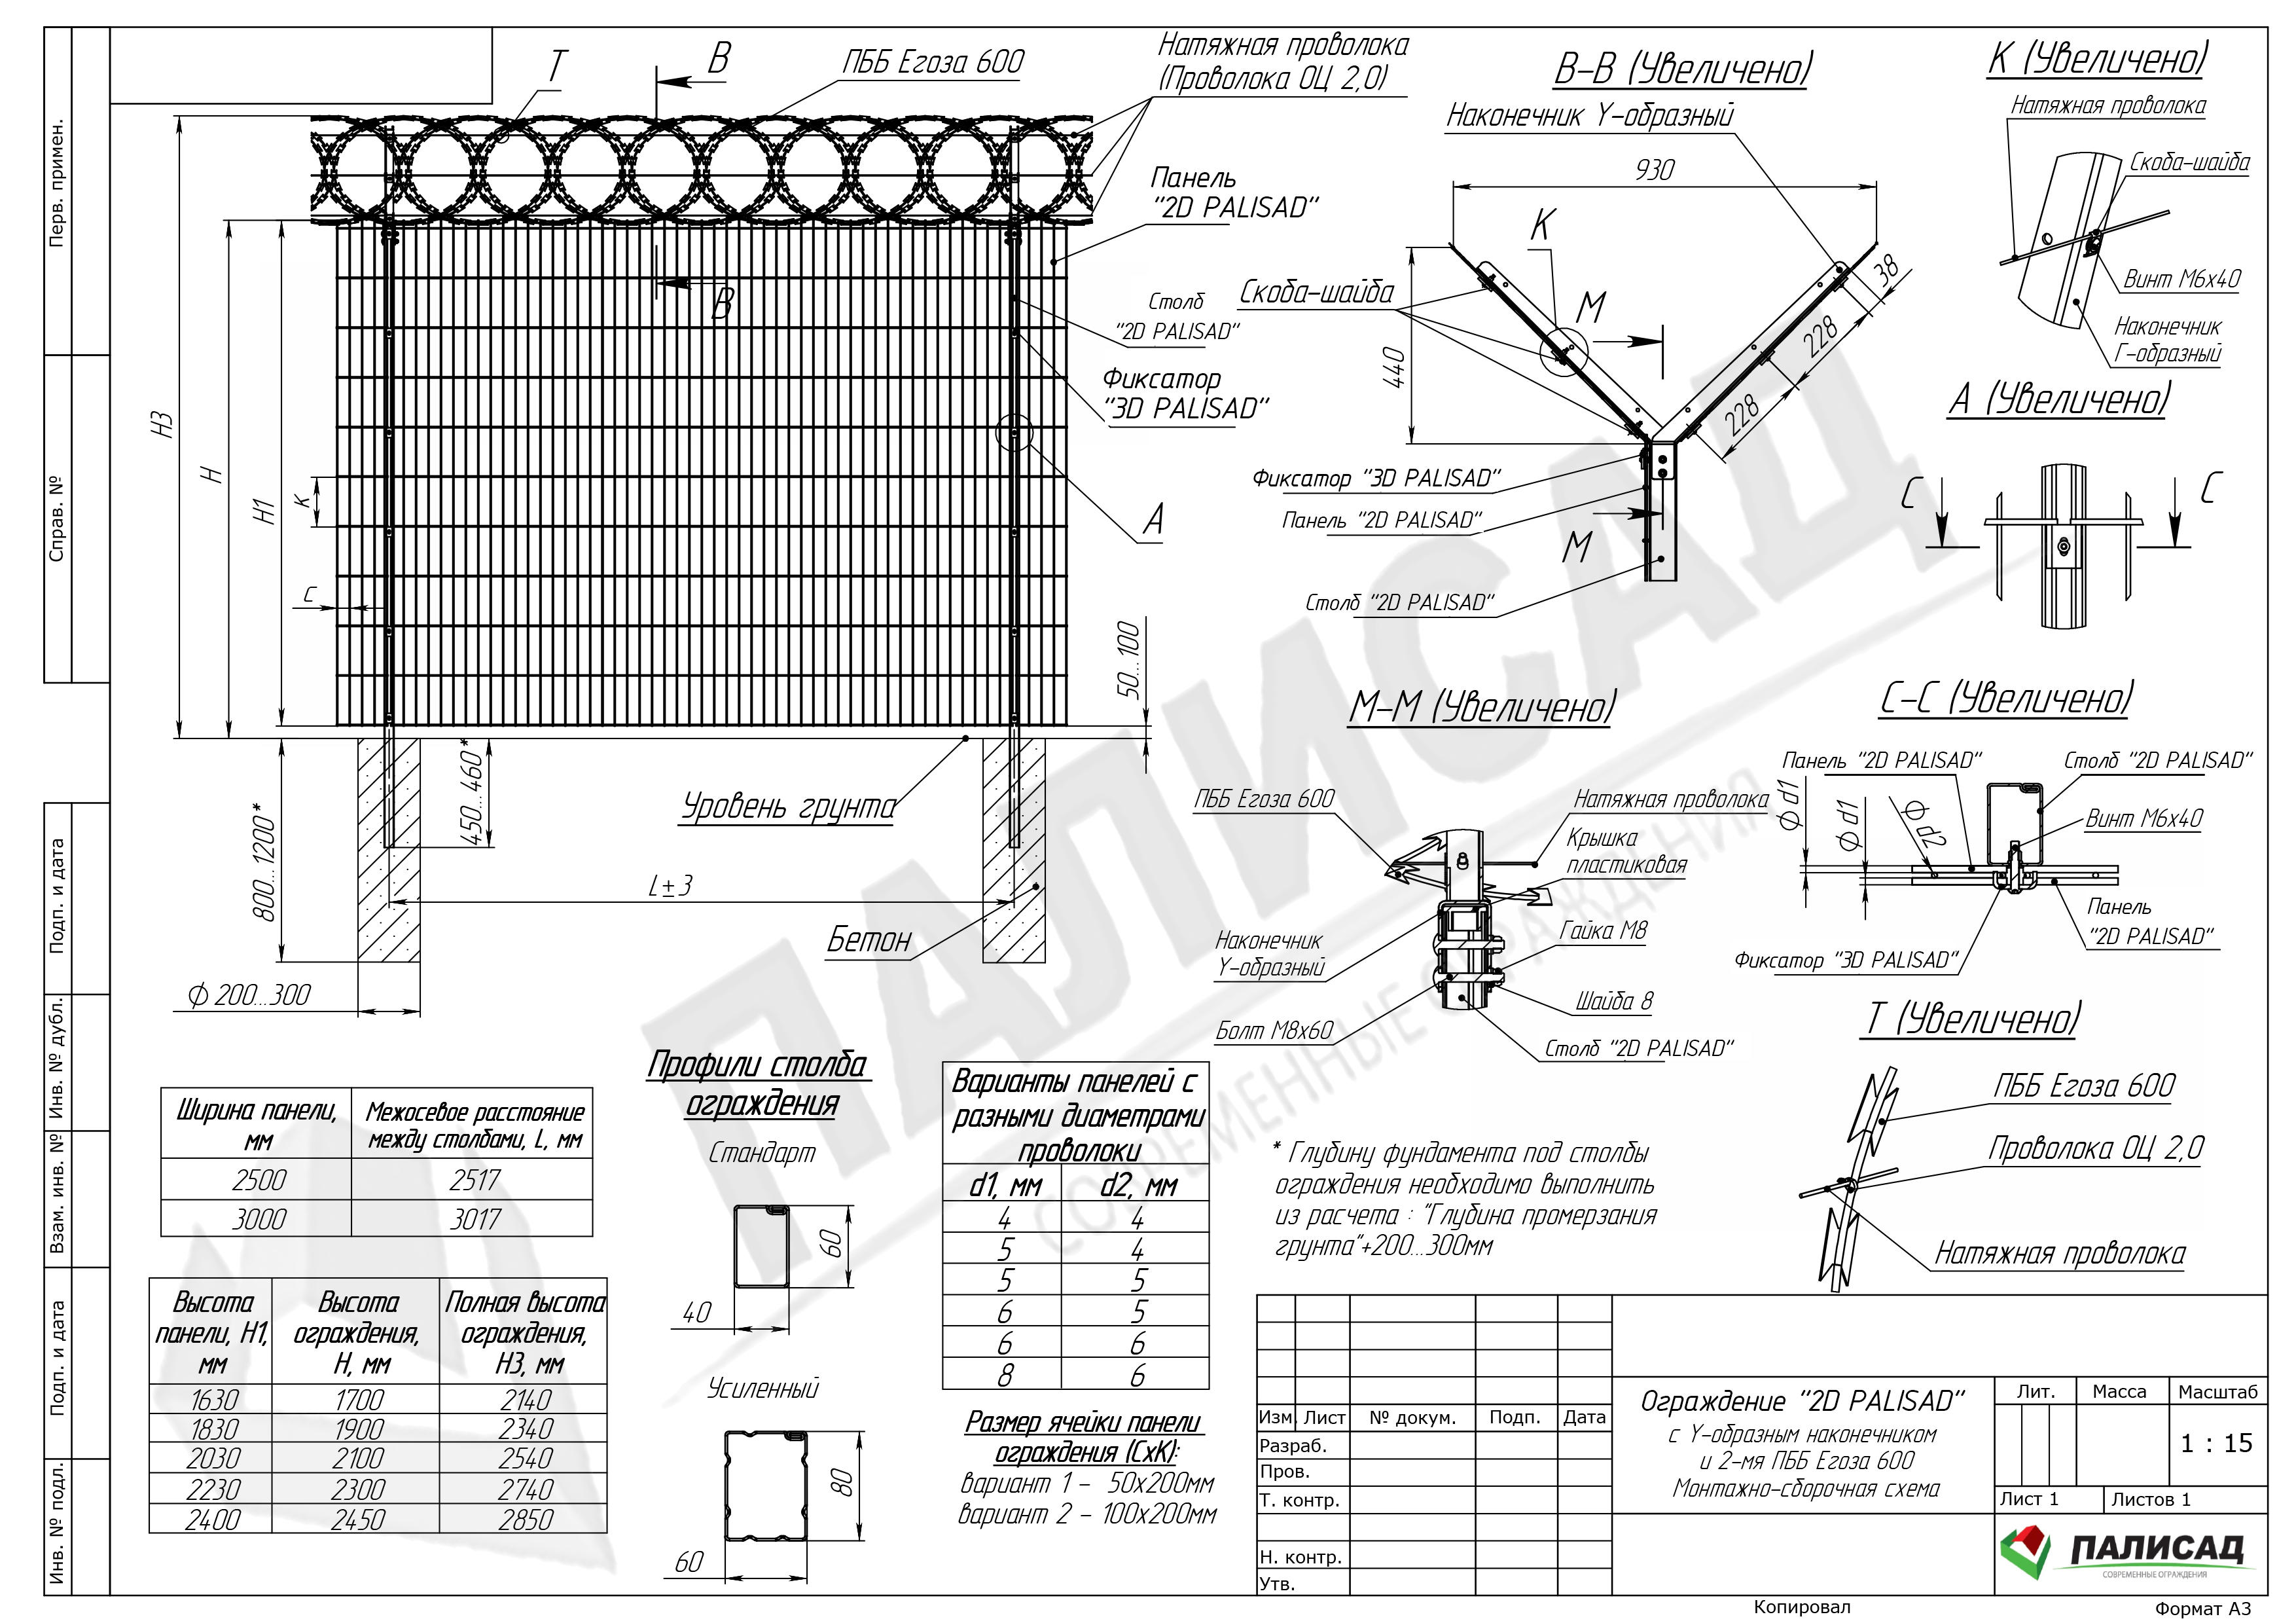 Пром-7-12-(ТОП_1,6-2,4-Ст-Y-ПББ)(PDF)